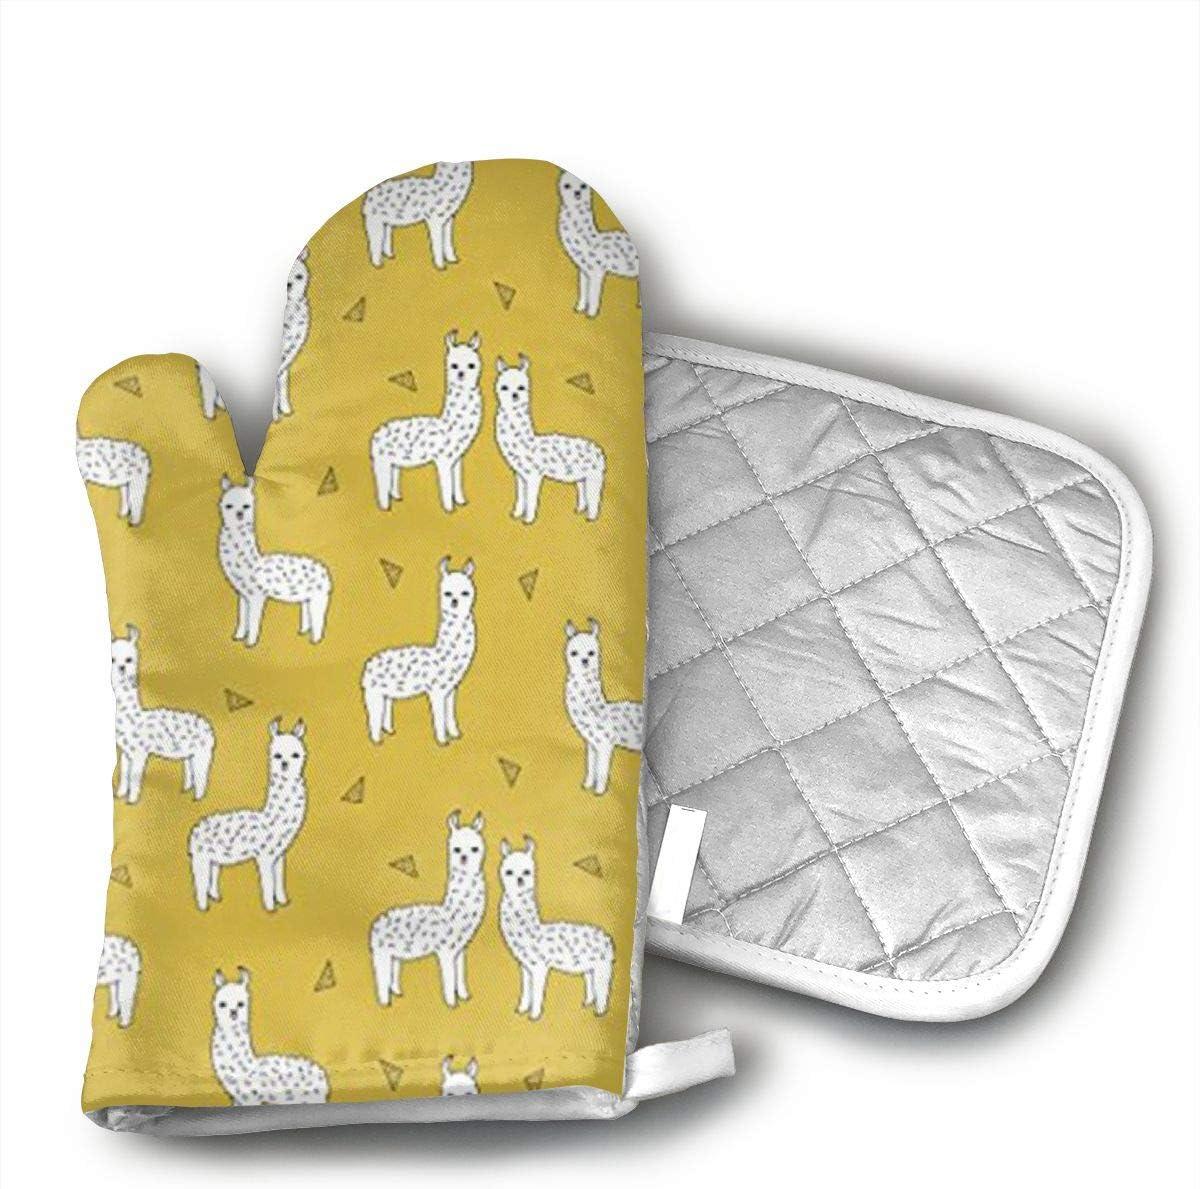 MHBZRDAZ96 Llama Mustard Yellow Oven Mitts with Cotton Lining, High Heat Resistant Kitchen Gloves, Non-Slip Potholder